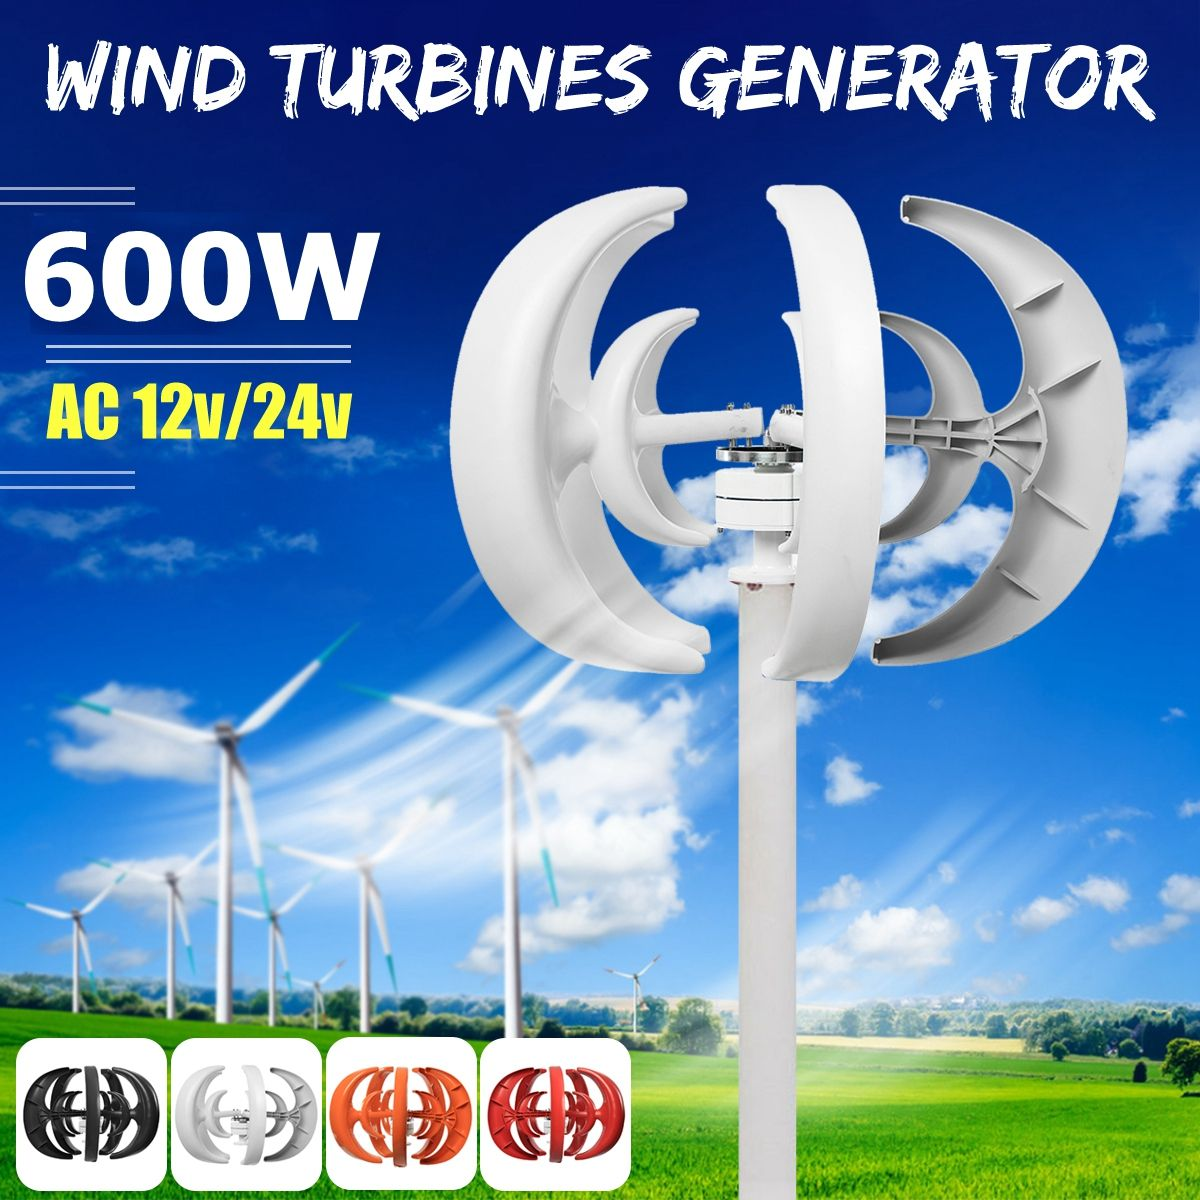 Max 600W AC 12V 24V Wind Turbine Generator Lantern 5 Blades Motor Kit Vertical Axis